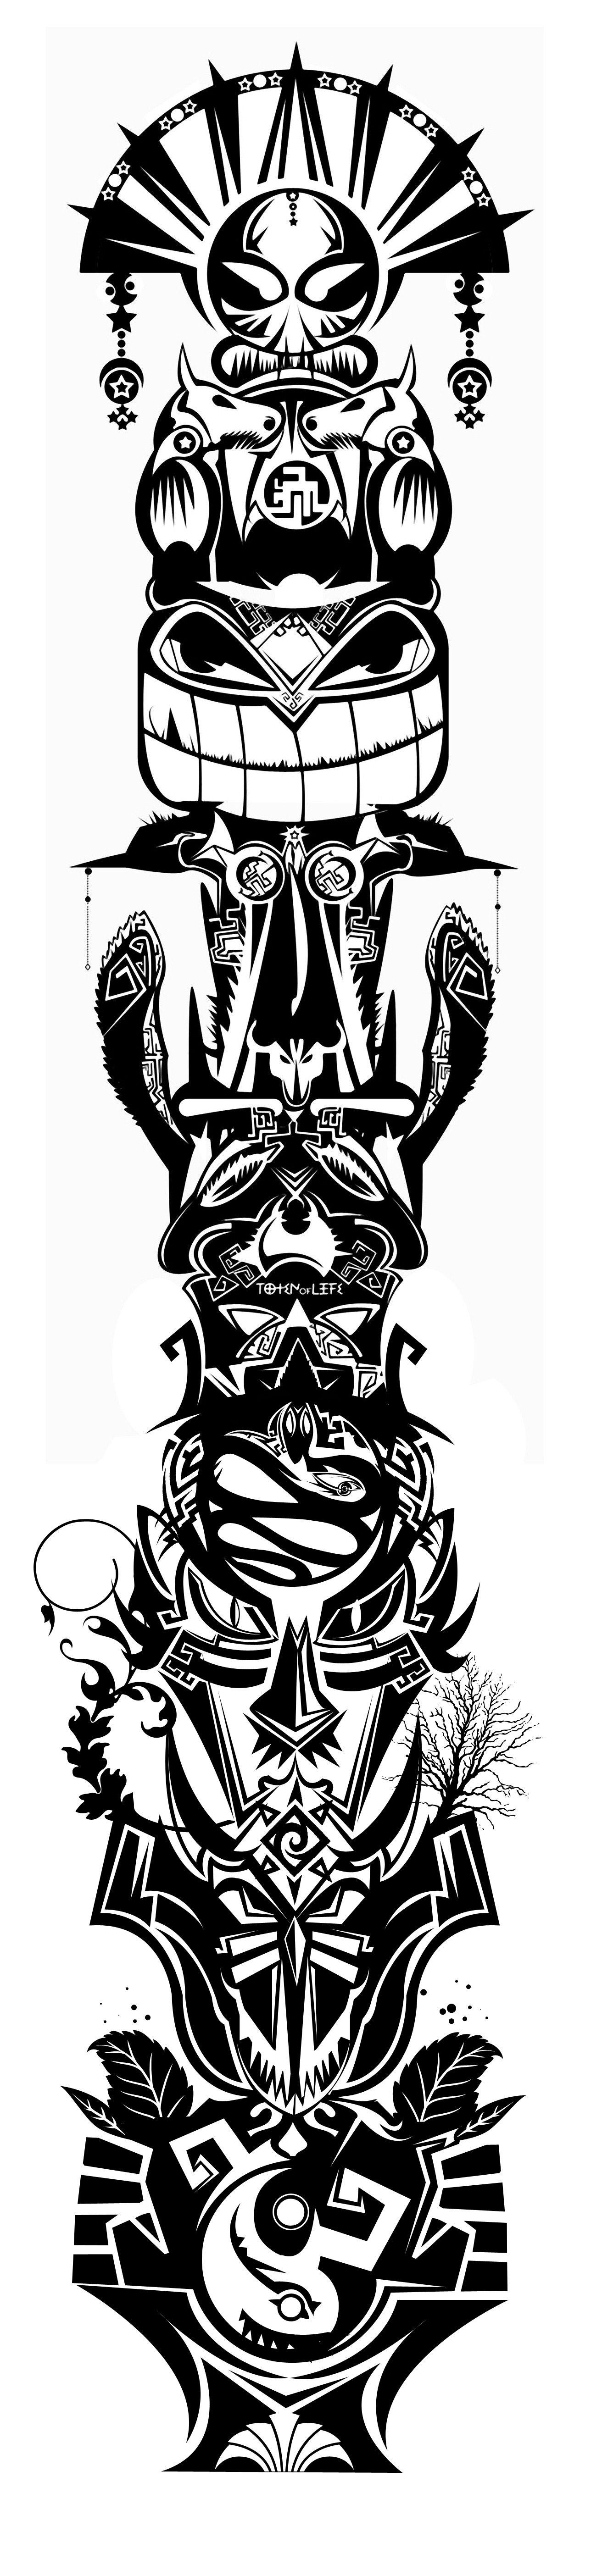 totem pole print cool stuff for my house pinterest totem